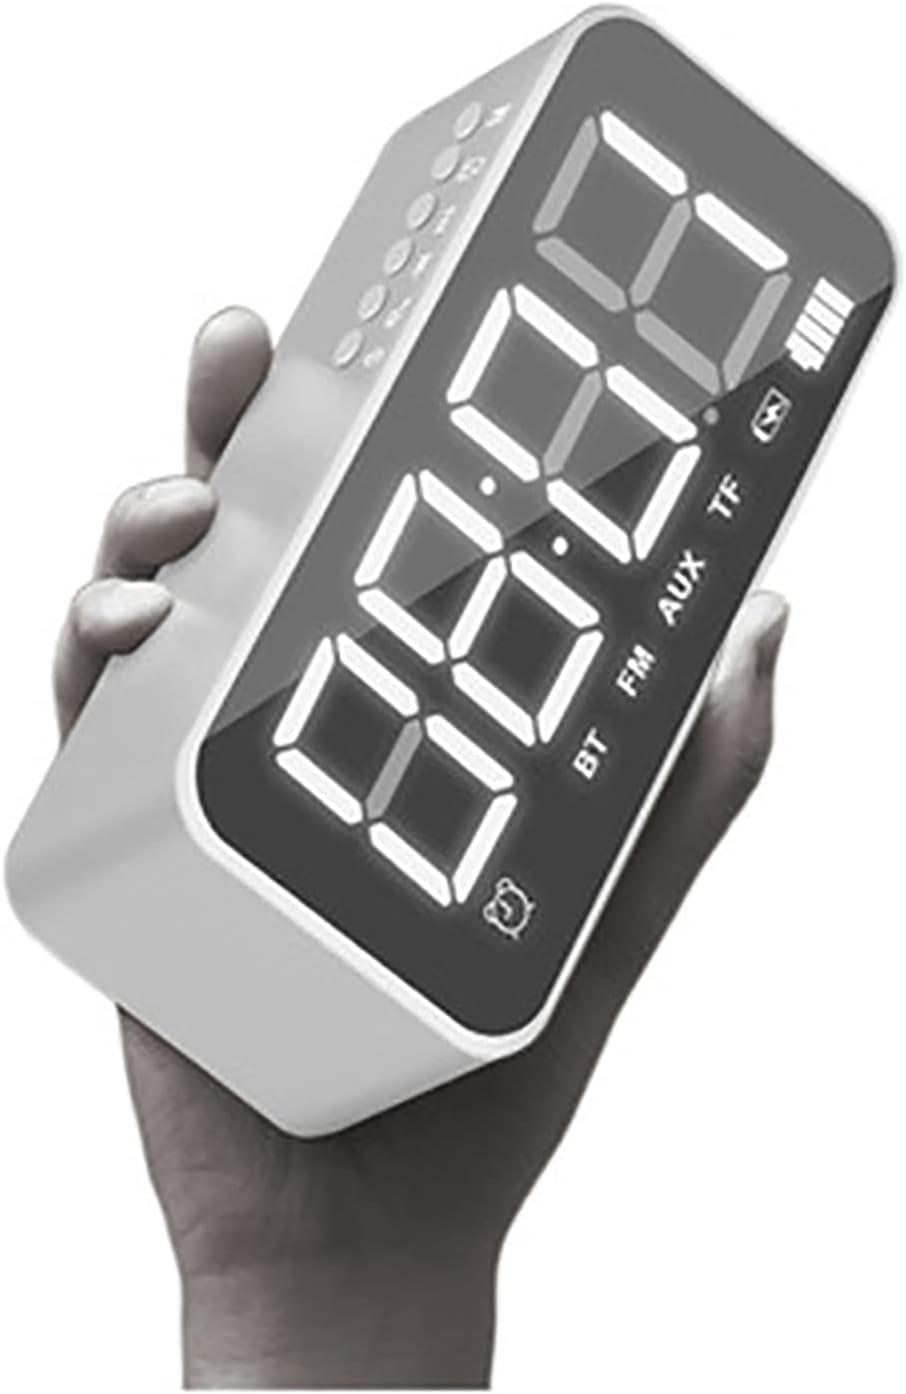 LED Digital Alarm Clock Outdoor Portable Card Surround 3D Latest Regular store item Car S